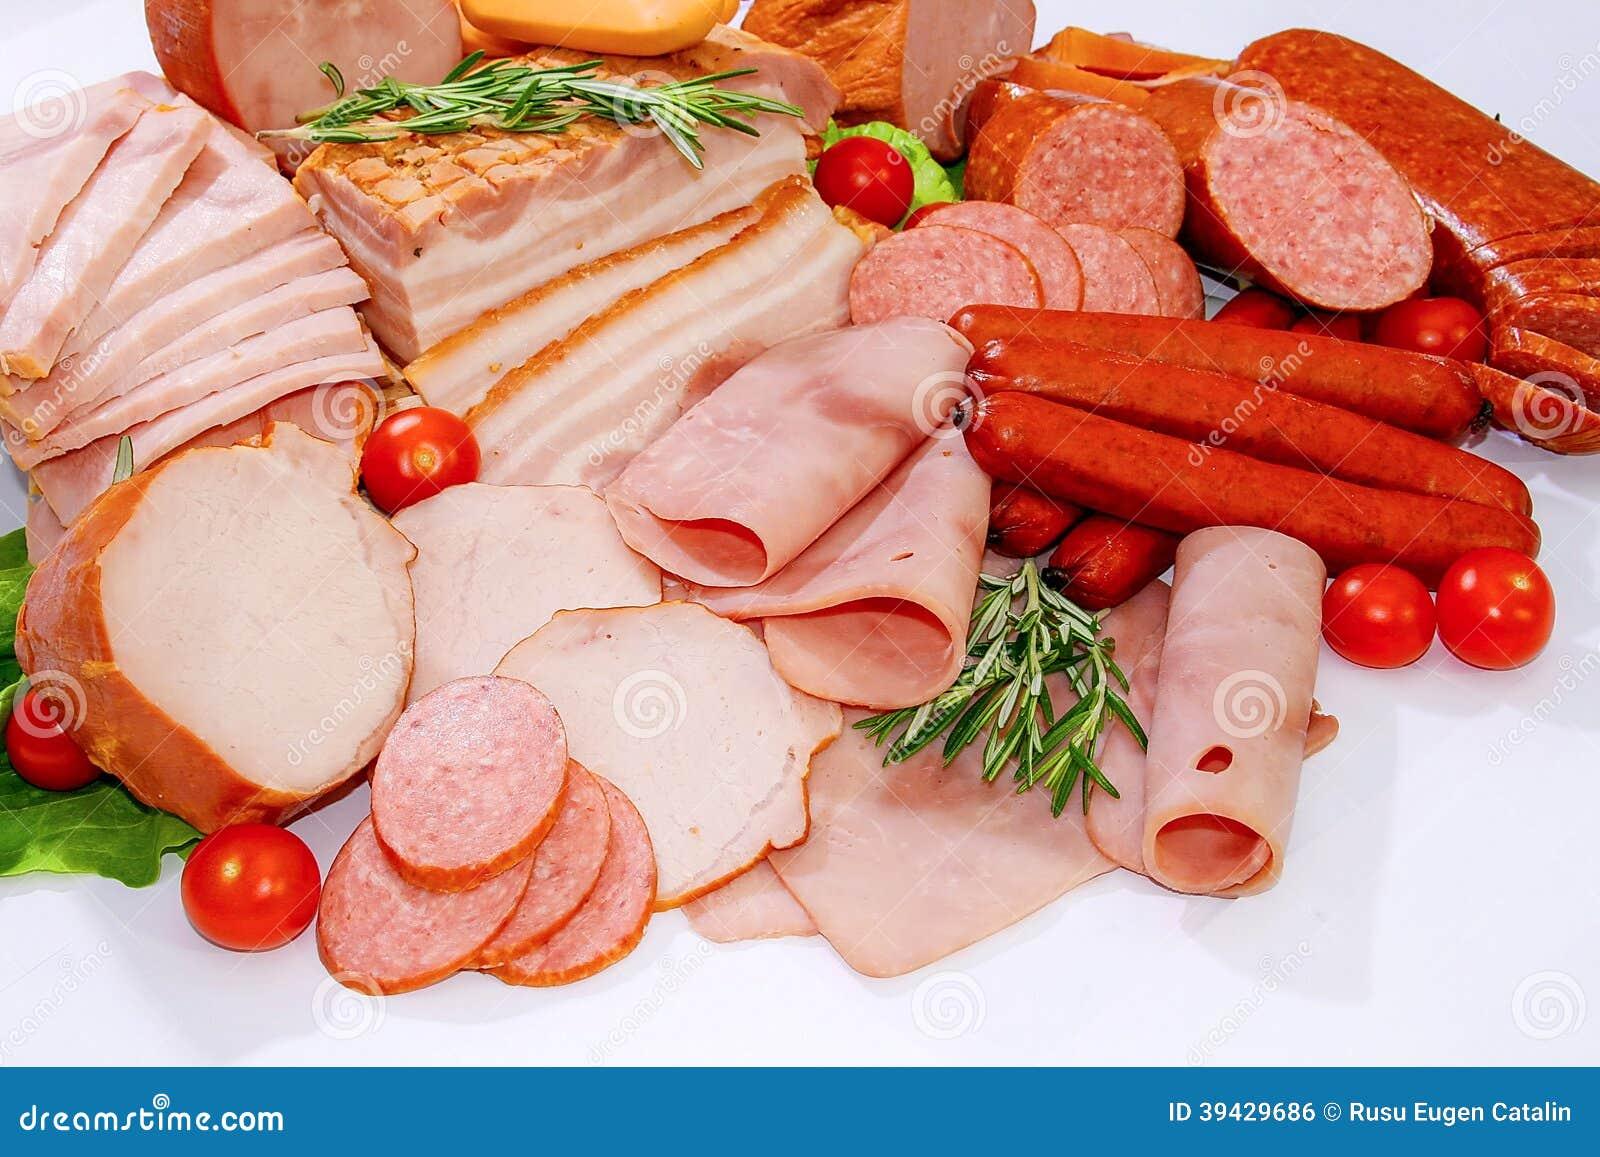 Carne y salchichas